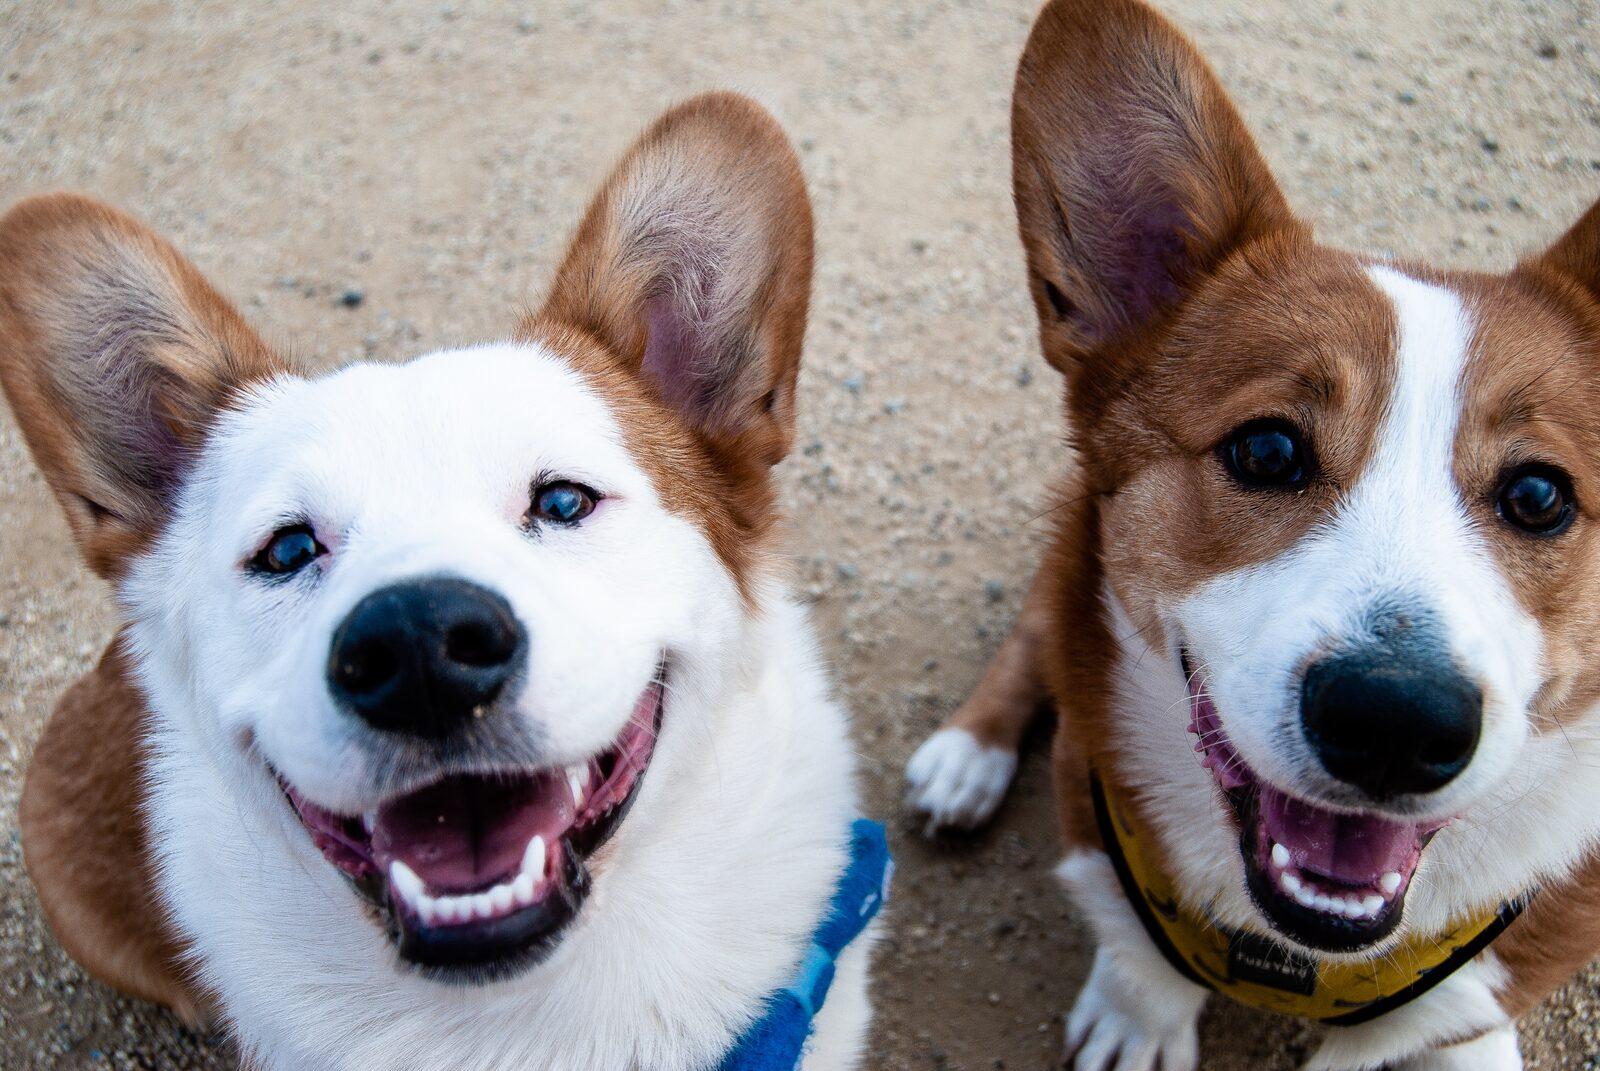 como curar perro con gusanos